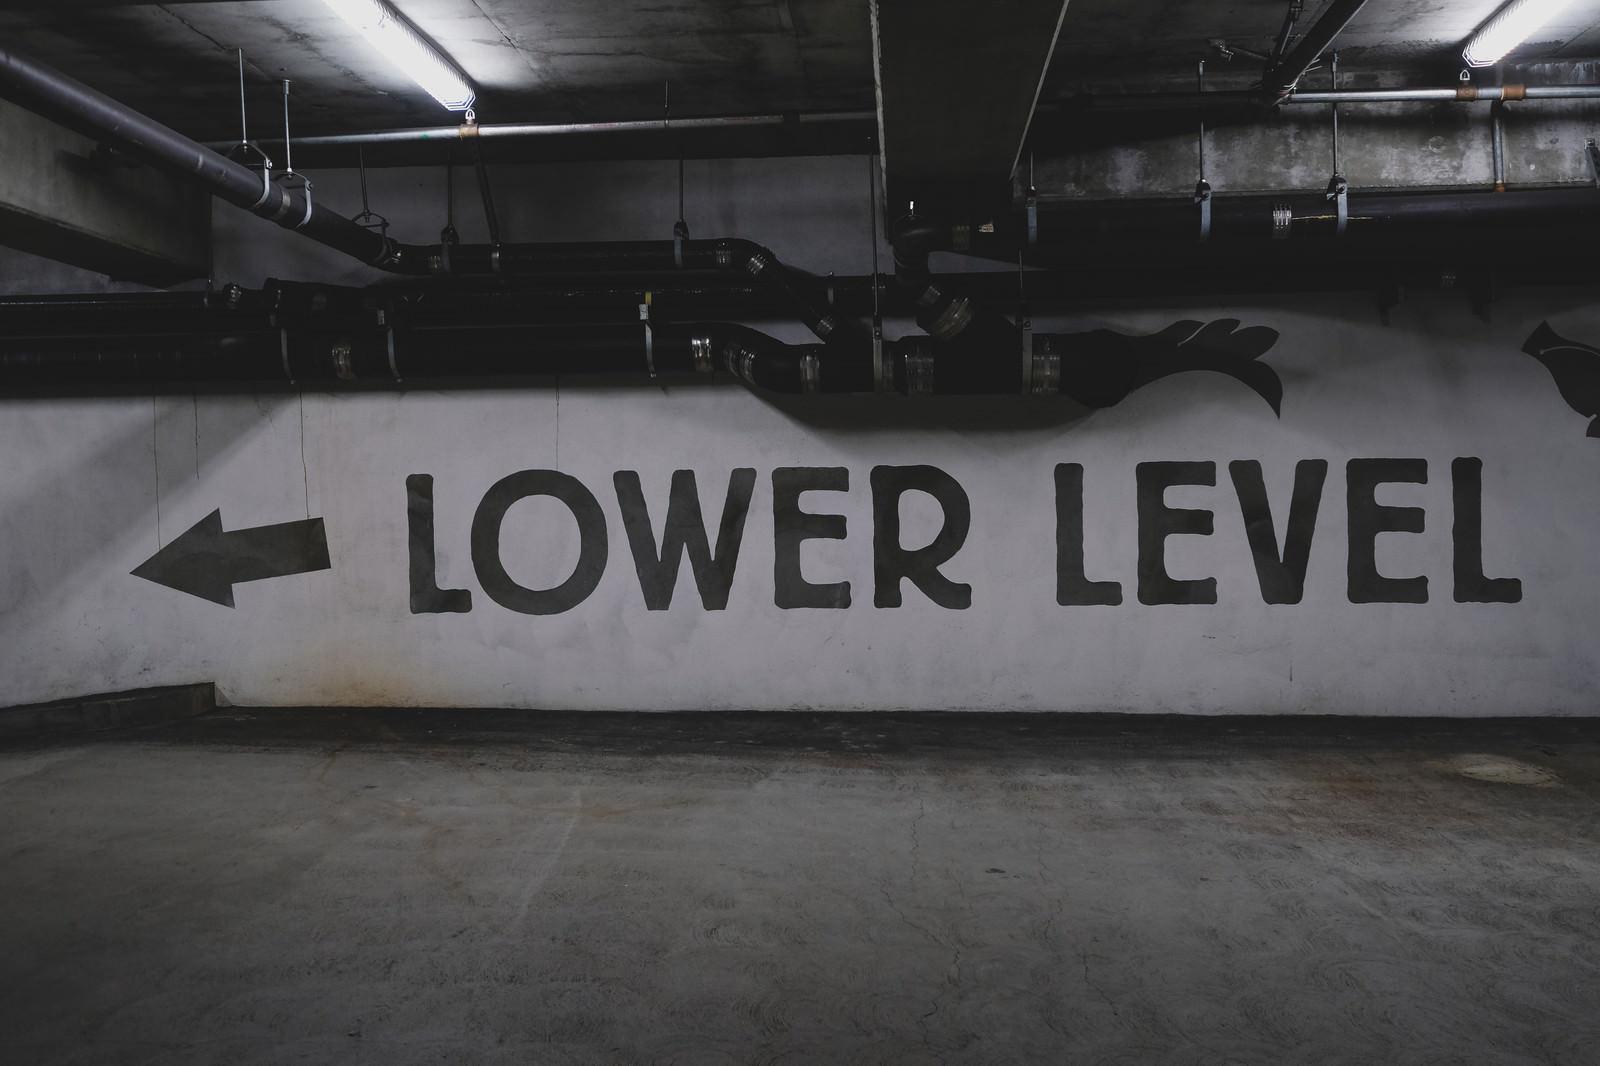 「← LOWER LEVEL← LOWER LEVEL」のフリー写真素材を拡大